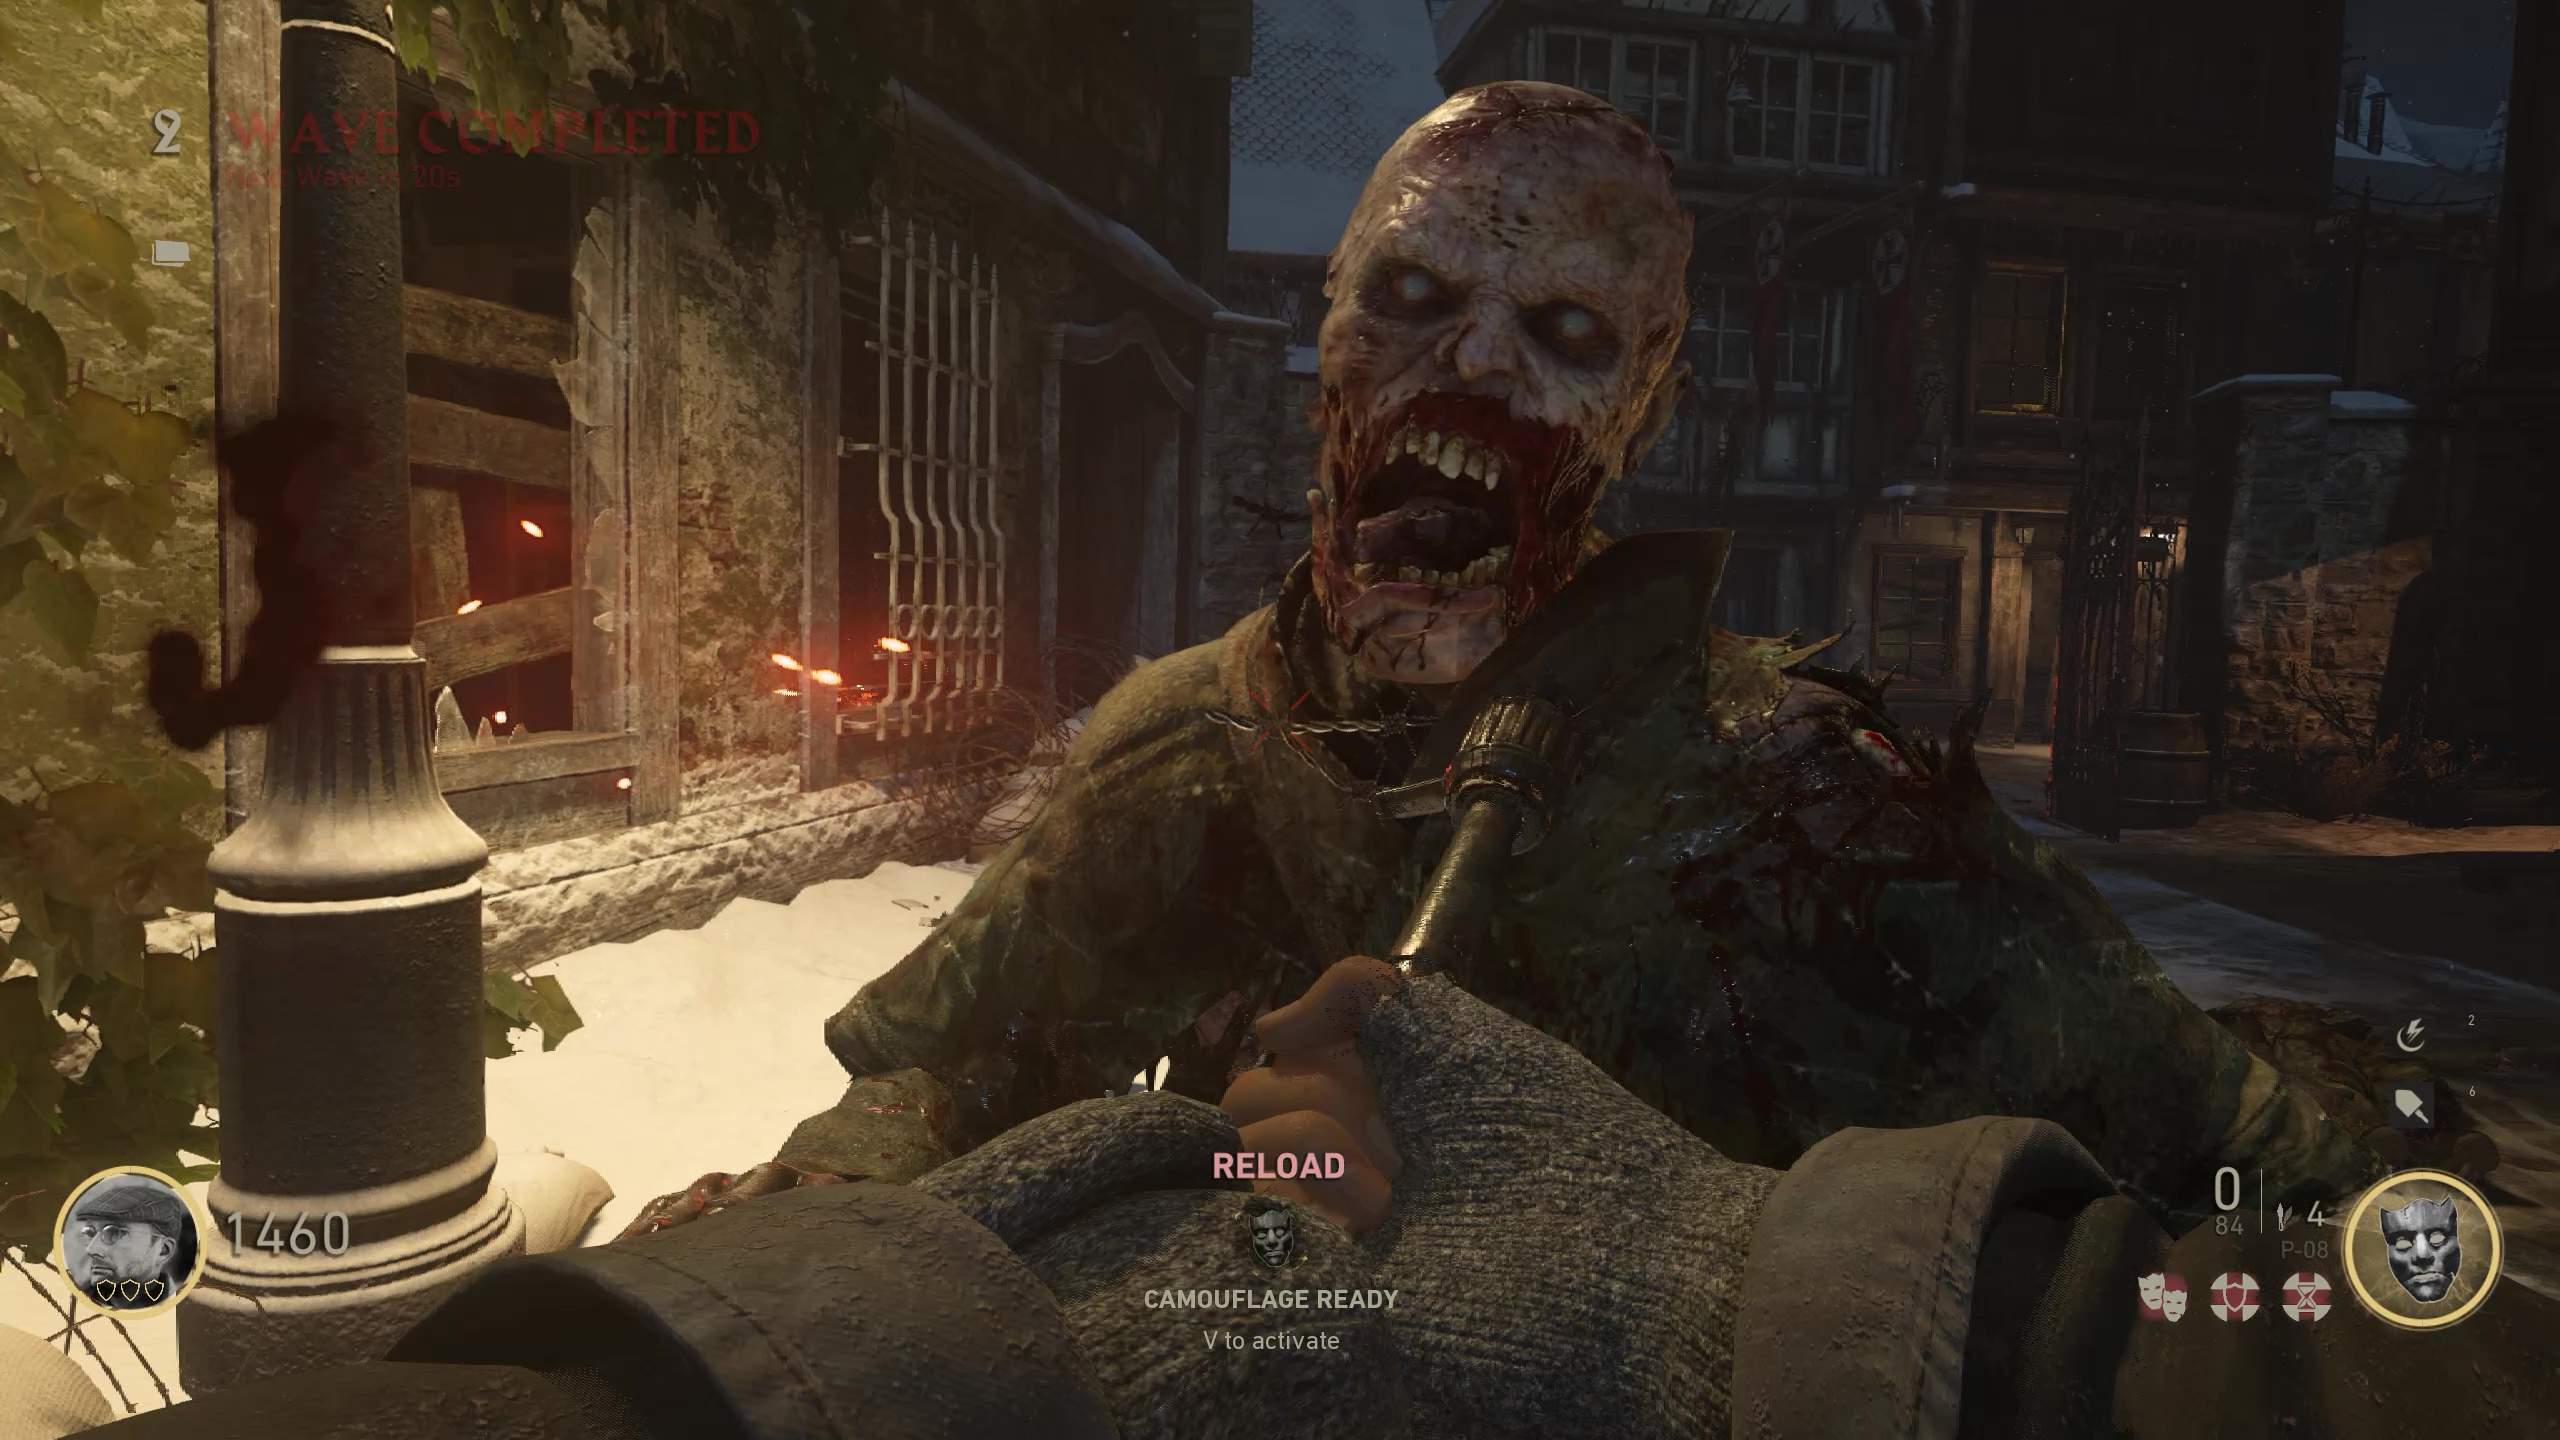 Call of Duty studio Sledgehammer Games has opened an Australian branch | PC Gamer